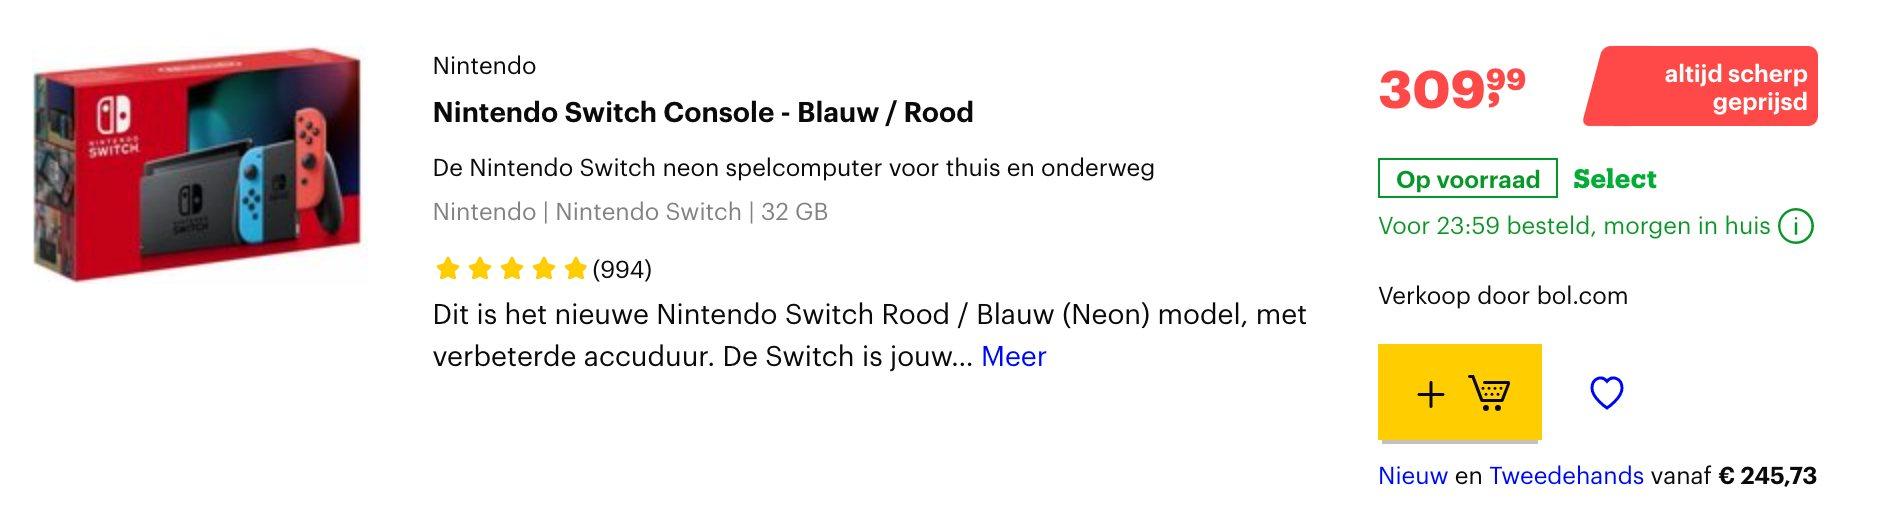 nintendo switch aanbieding bol.com